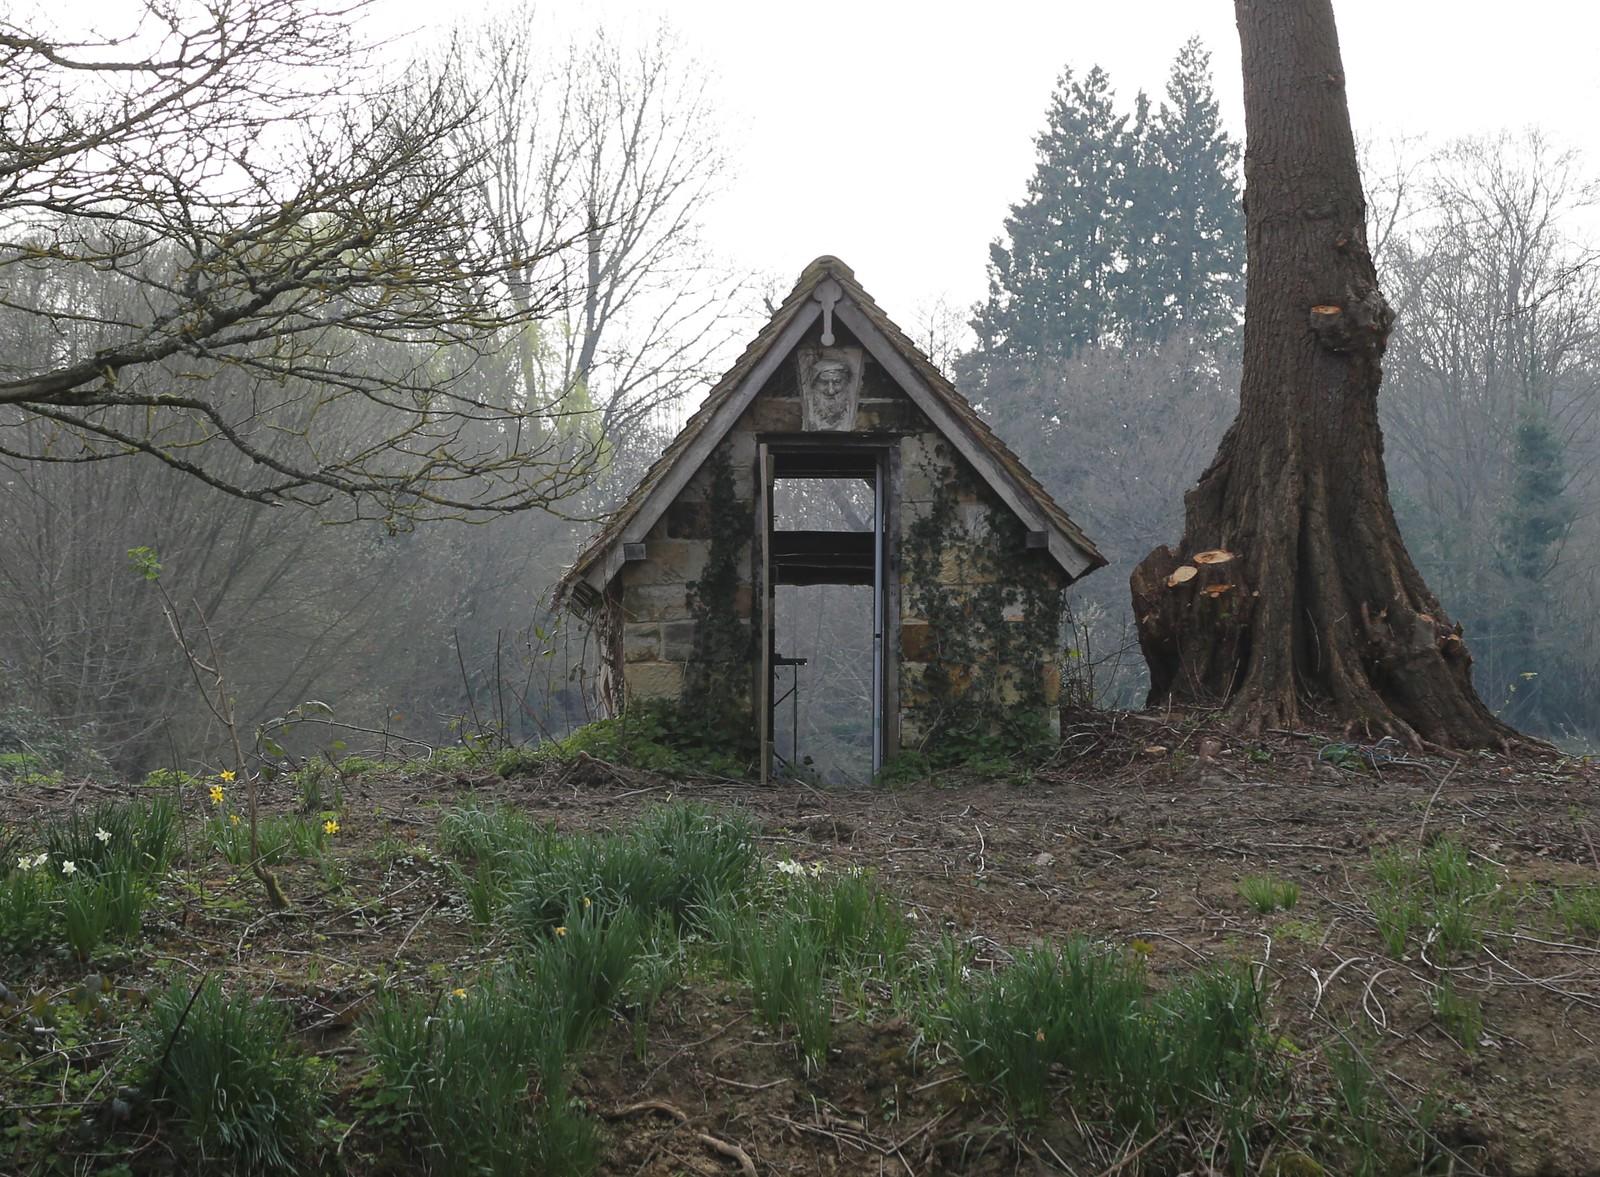 Through the hut - Groombridge Place